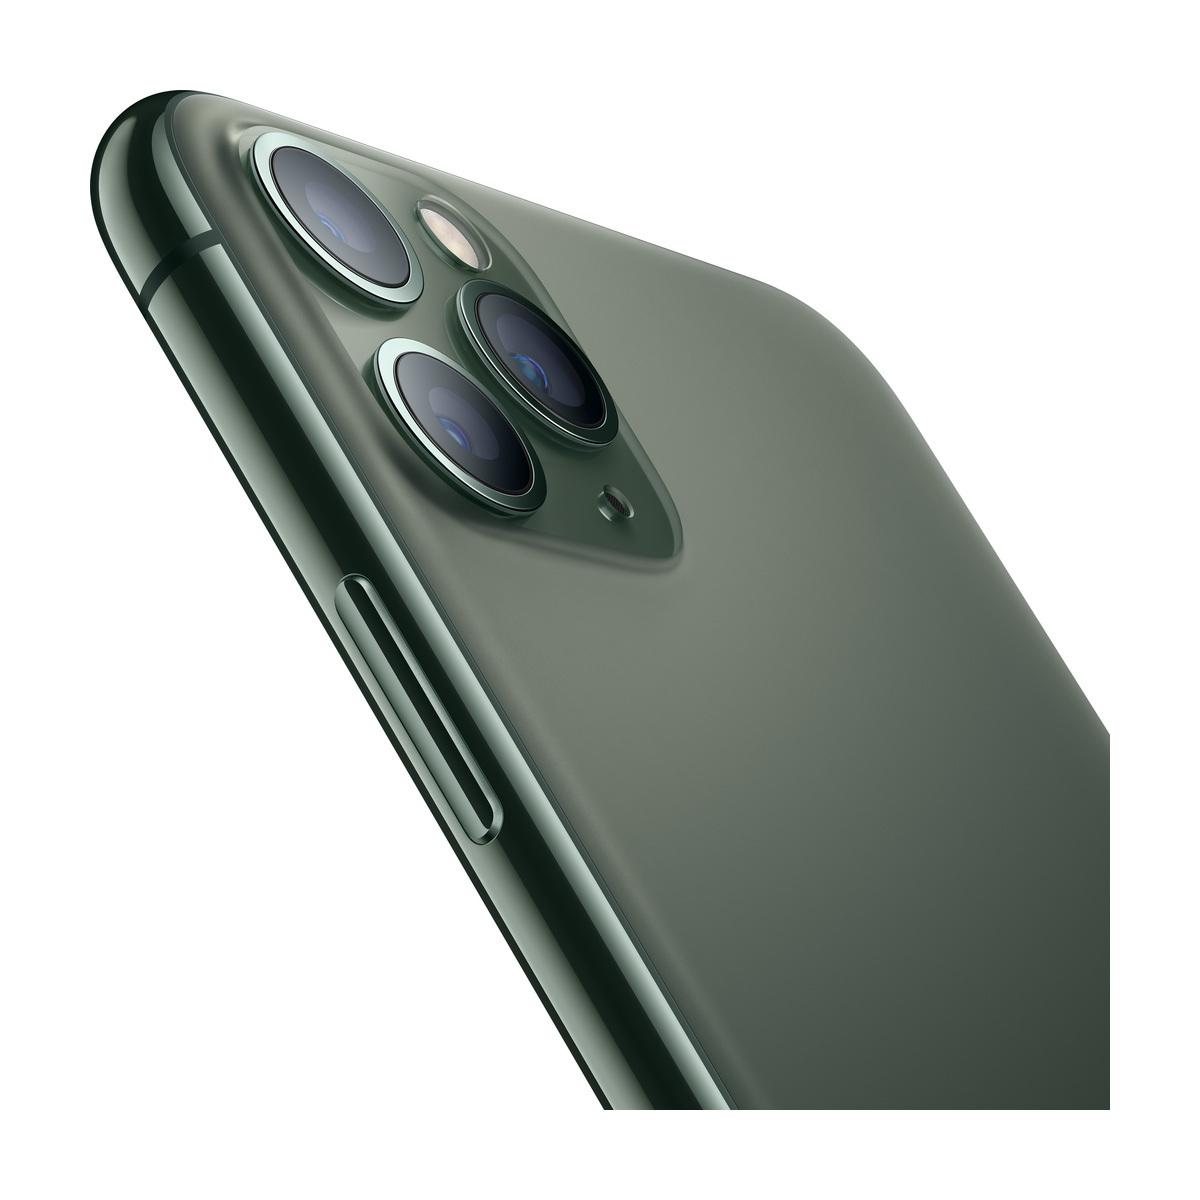 APPLE IPHONE 11 PRO 64 GB MIDNIGHT GREEN Power.no